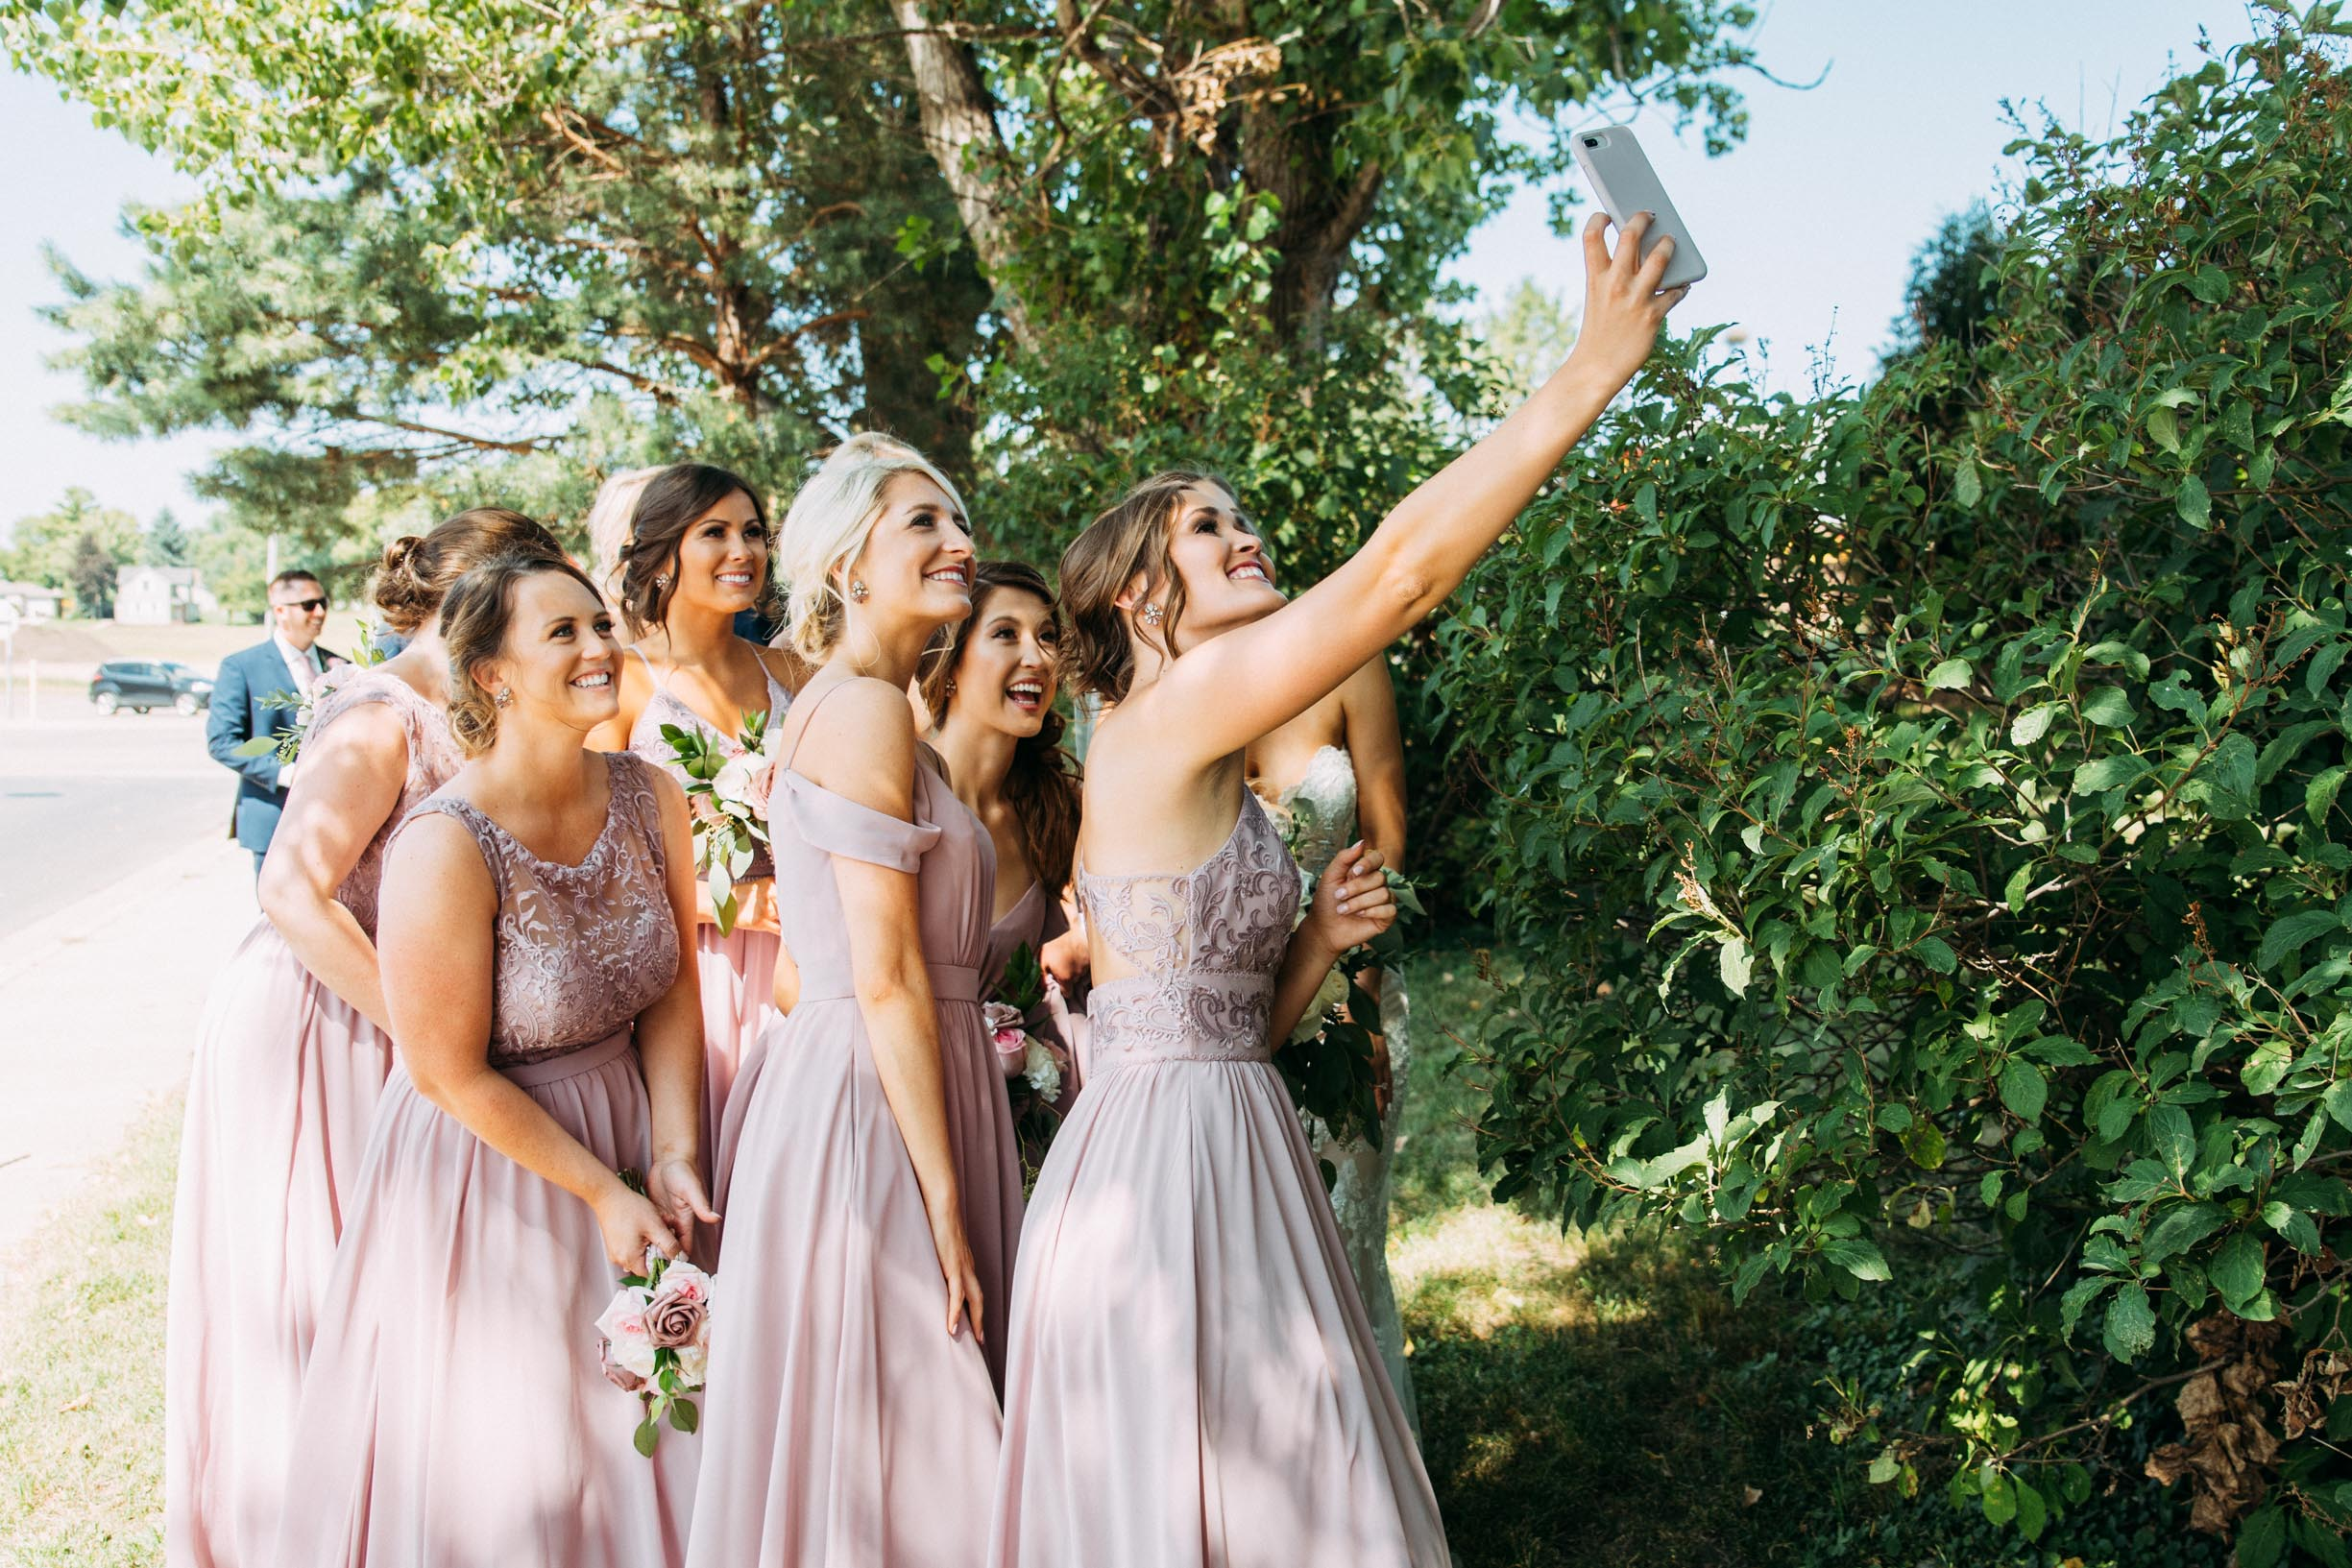 35-WeddingsattheBroz_Minnesota_WeddingBlog_WeddingParty.jpg